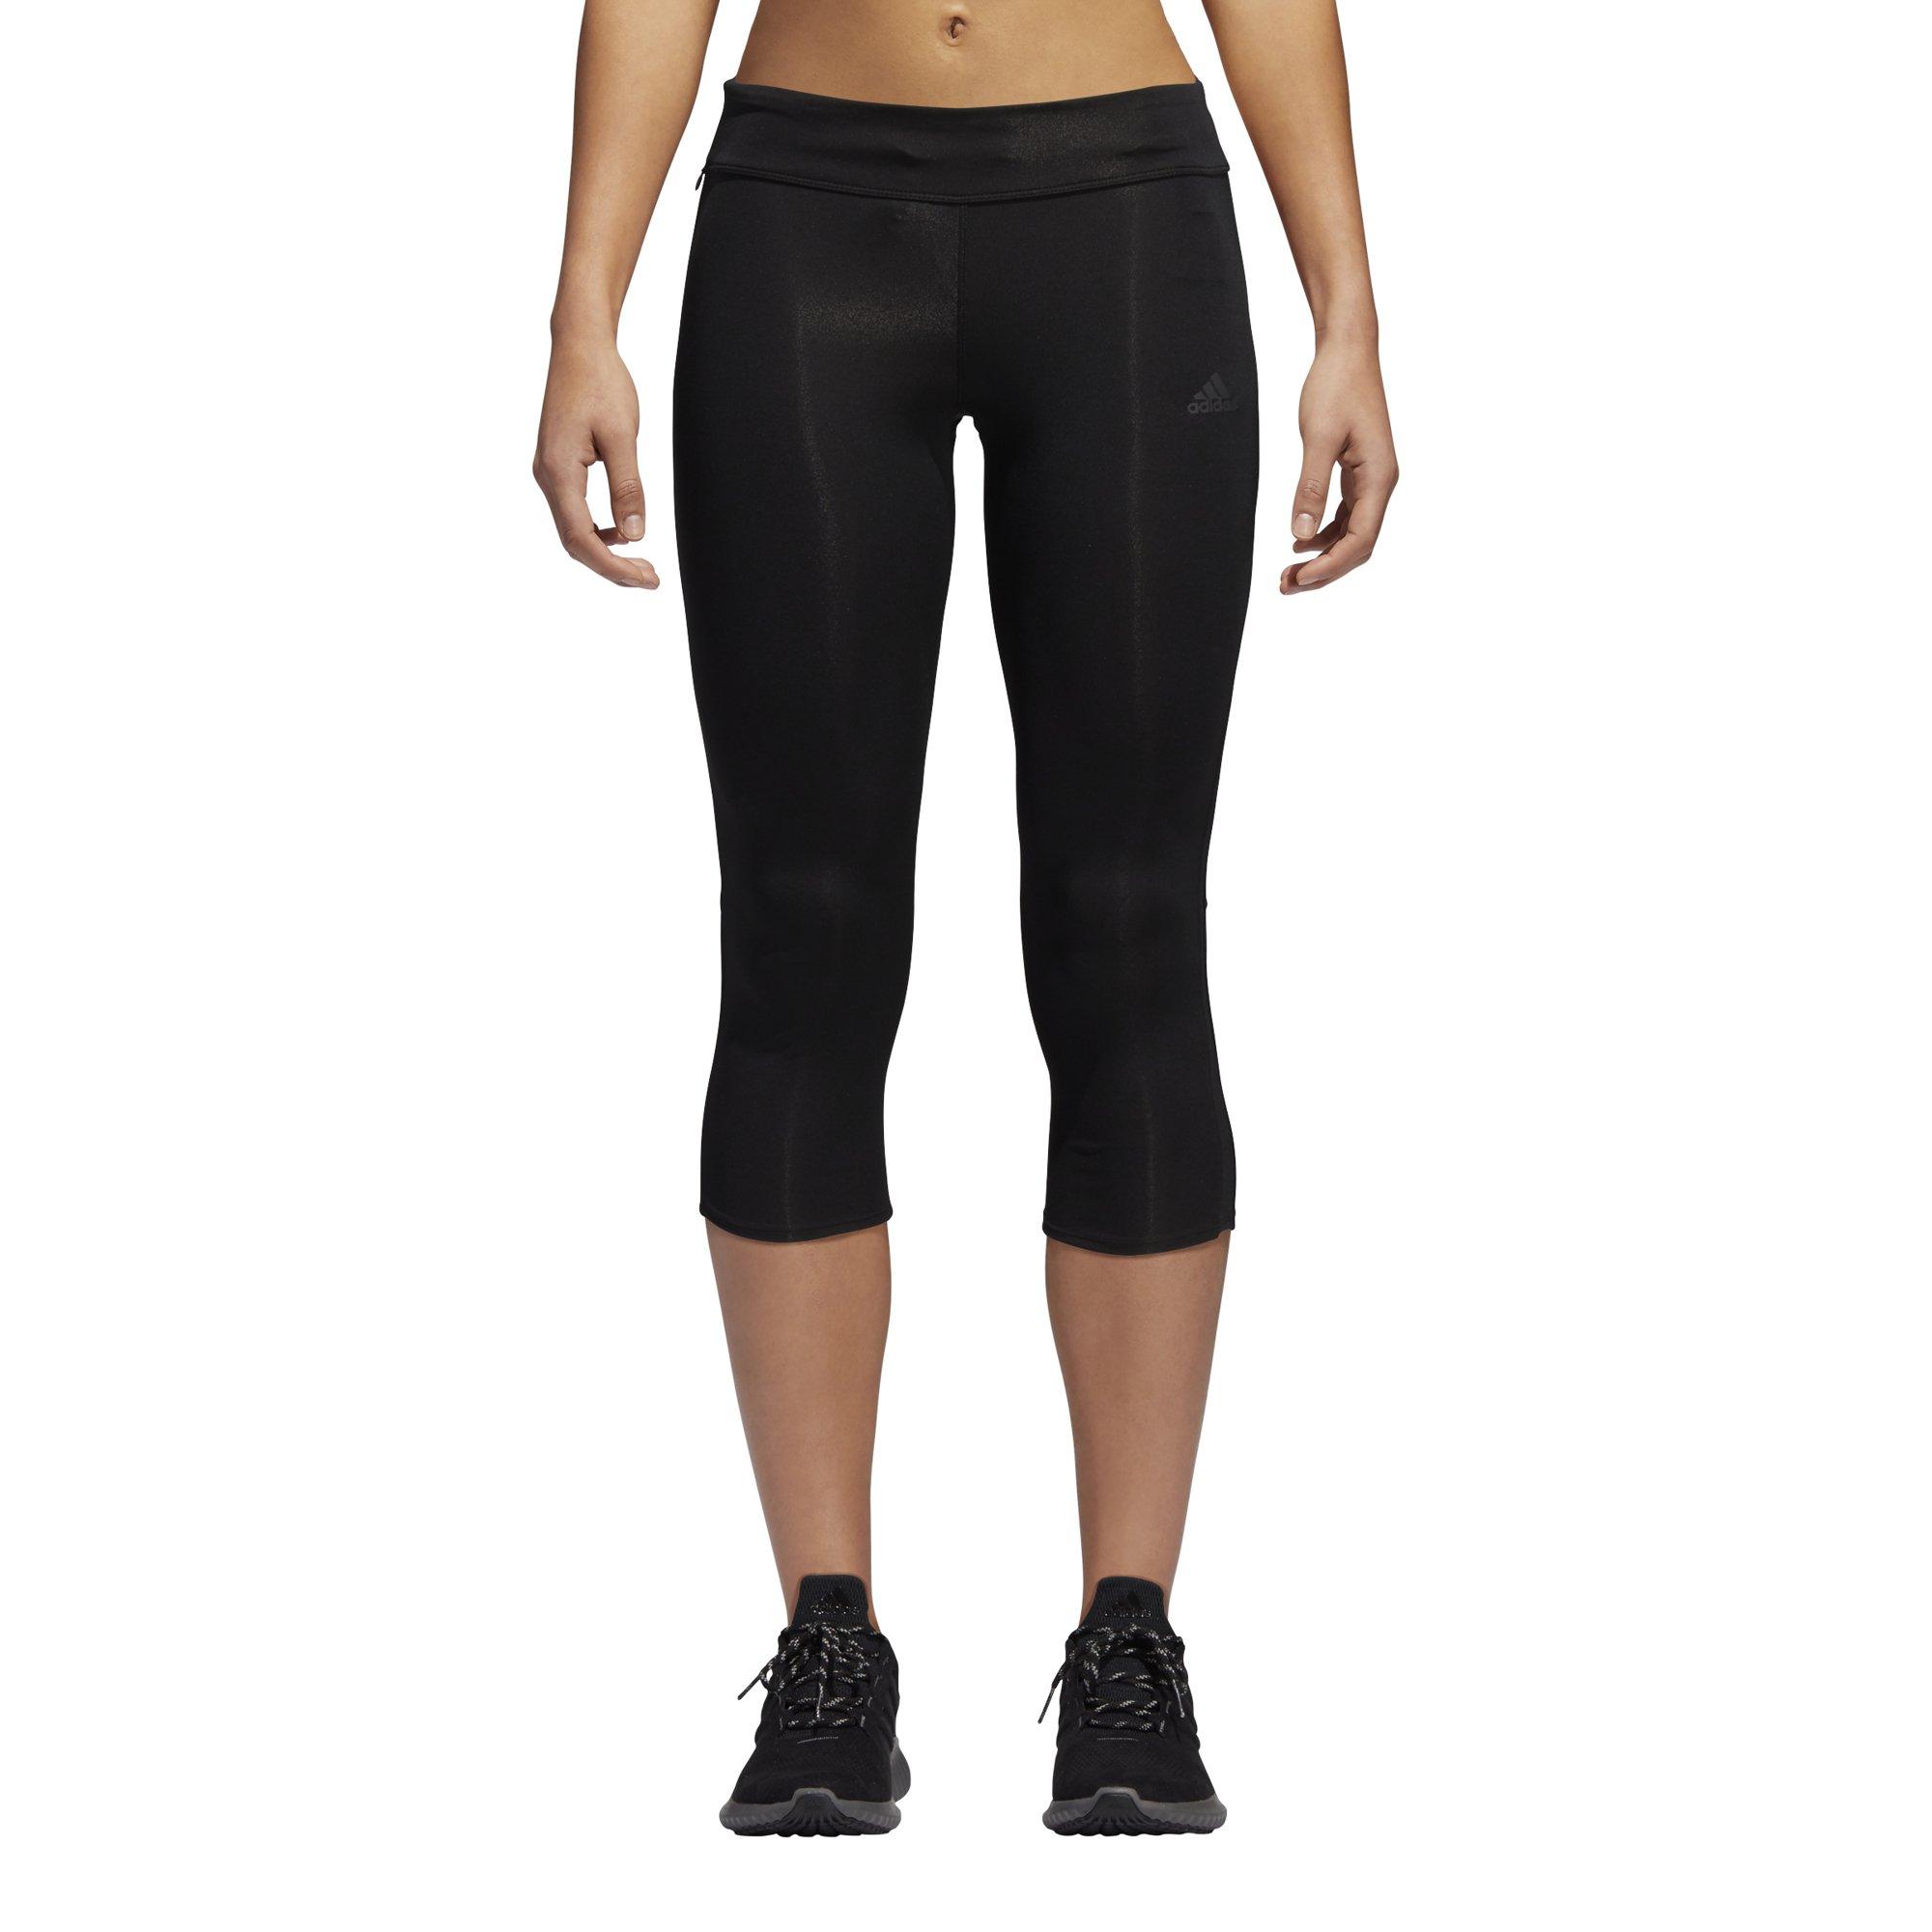 adidas Women's Response Tights, Black/Black, X-Small